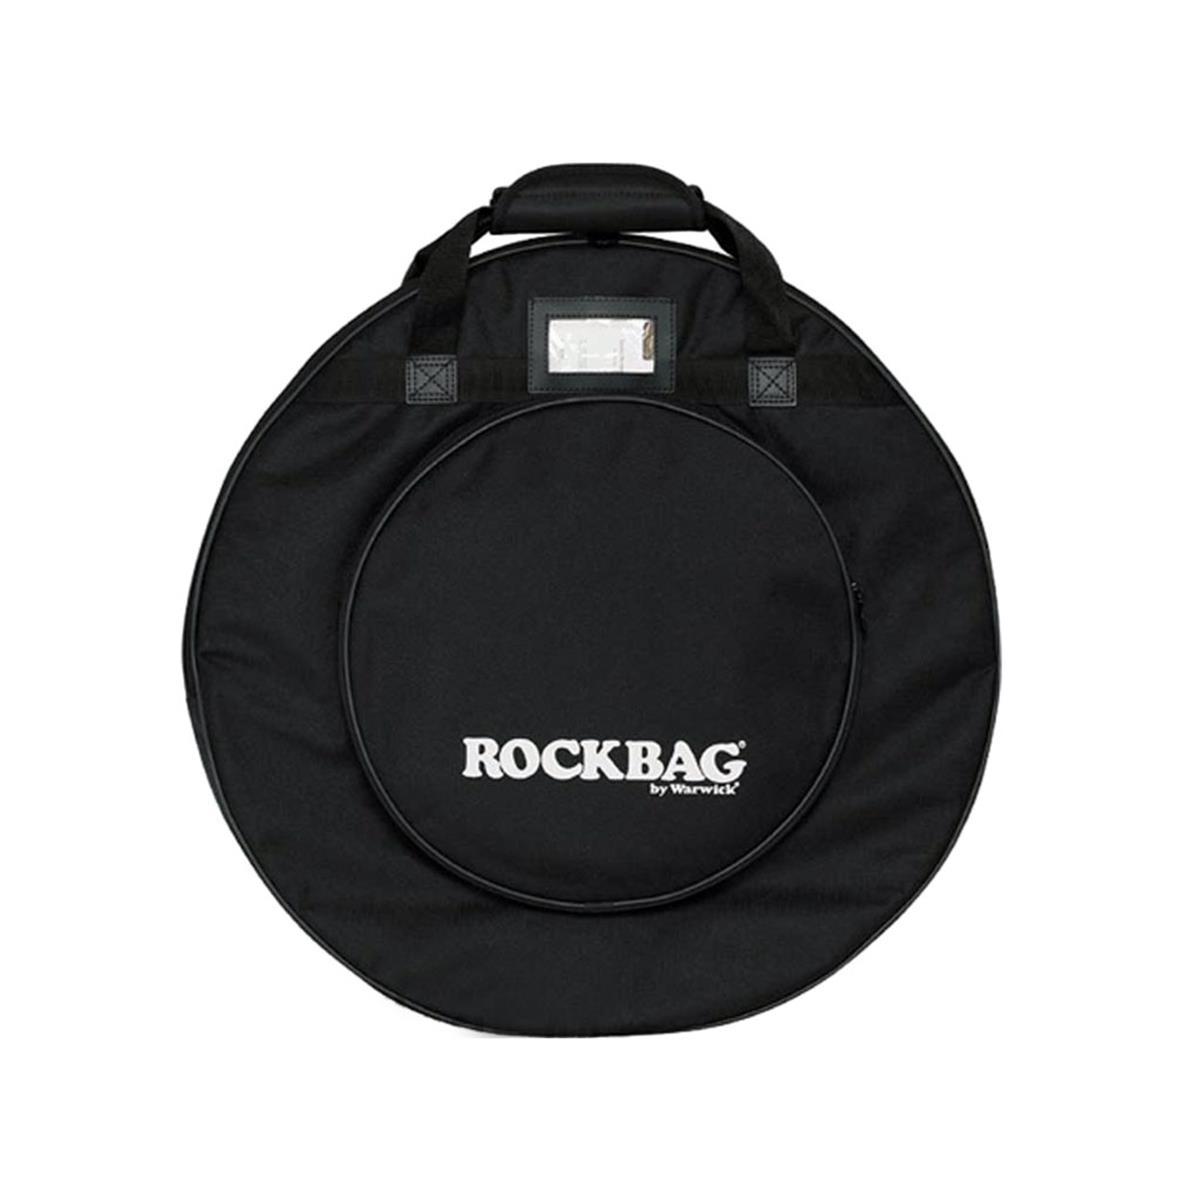 ROCKBAG RB22540B PORTAPIATTI DELUXE